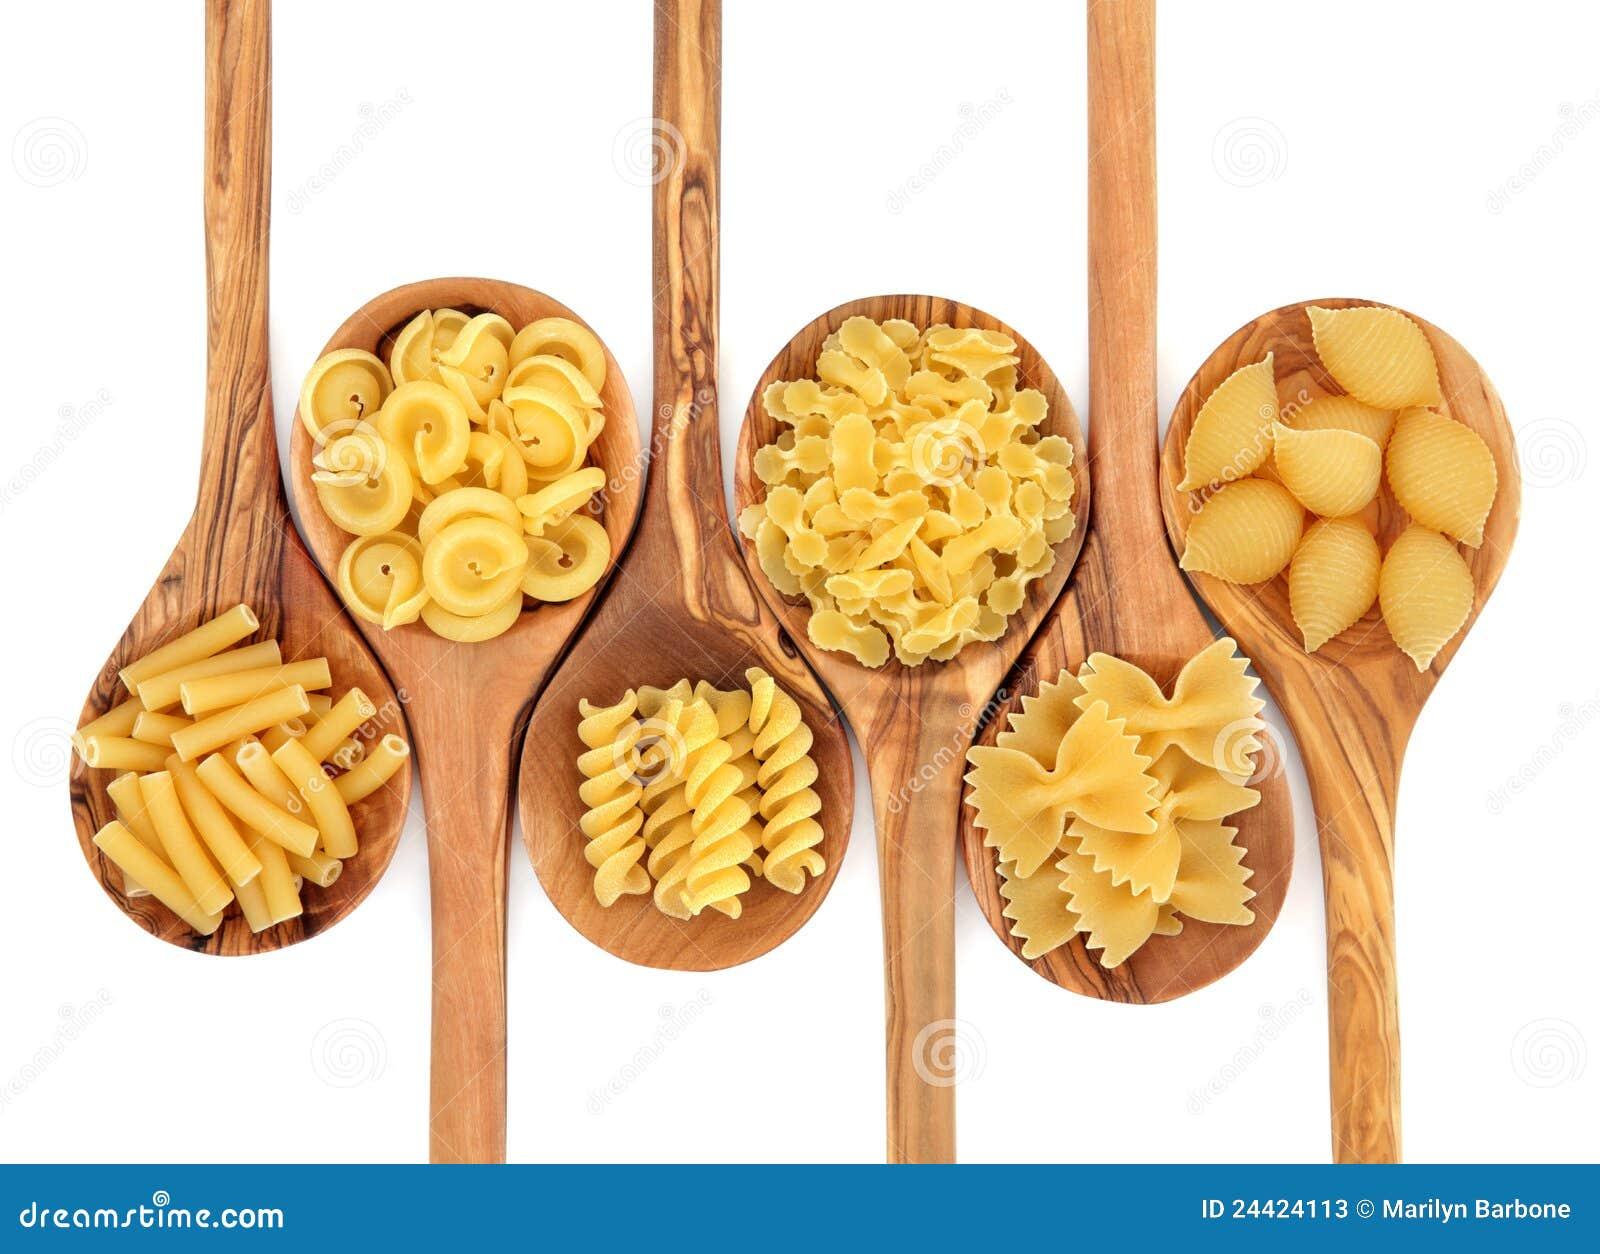 pasta varieties stock photos image 24424113 pepper clip art outline pepper clip art free